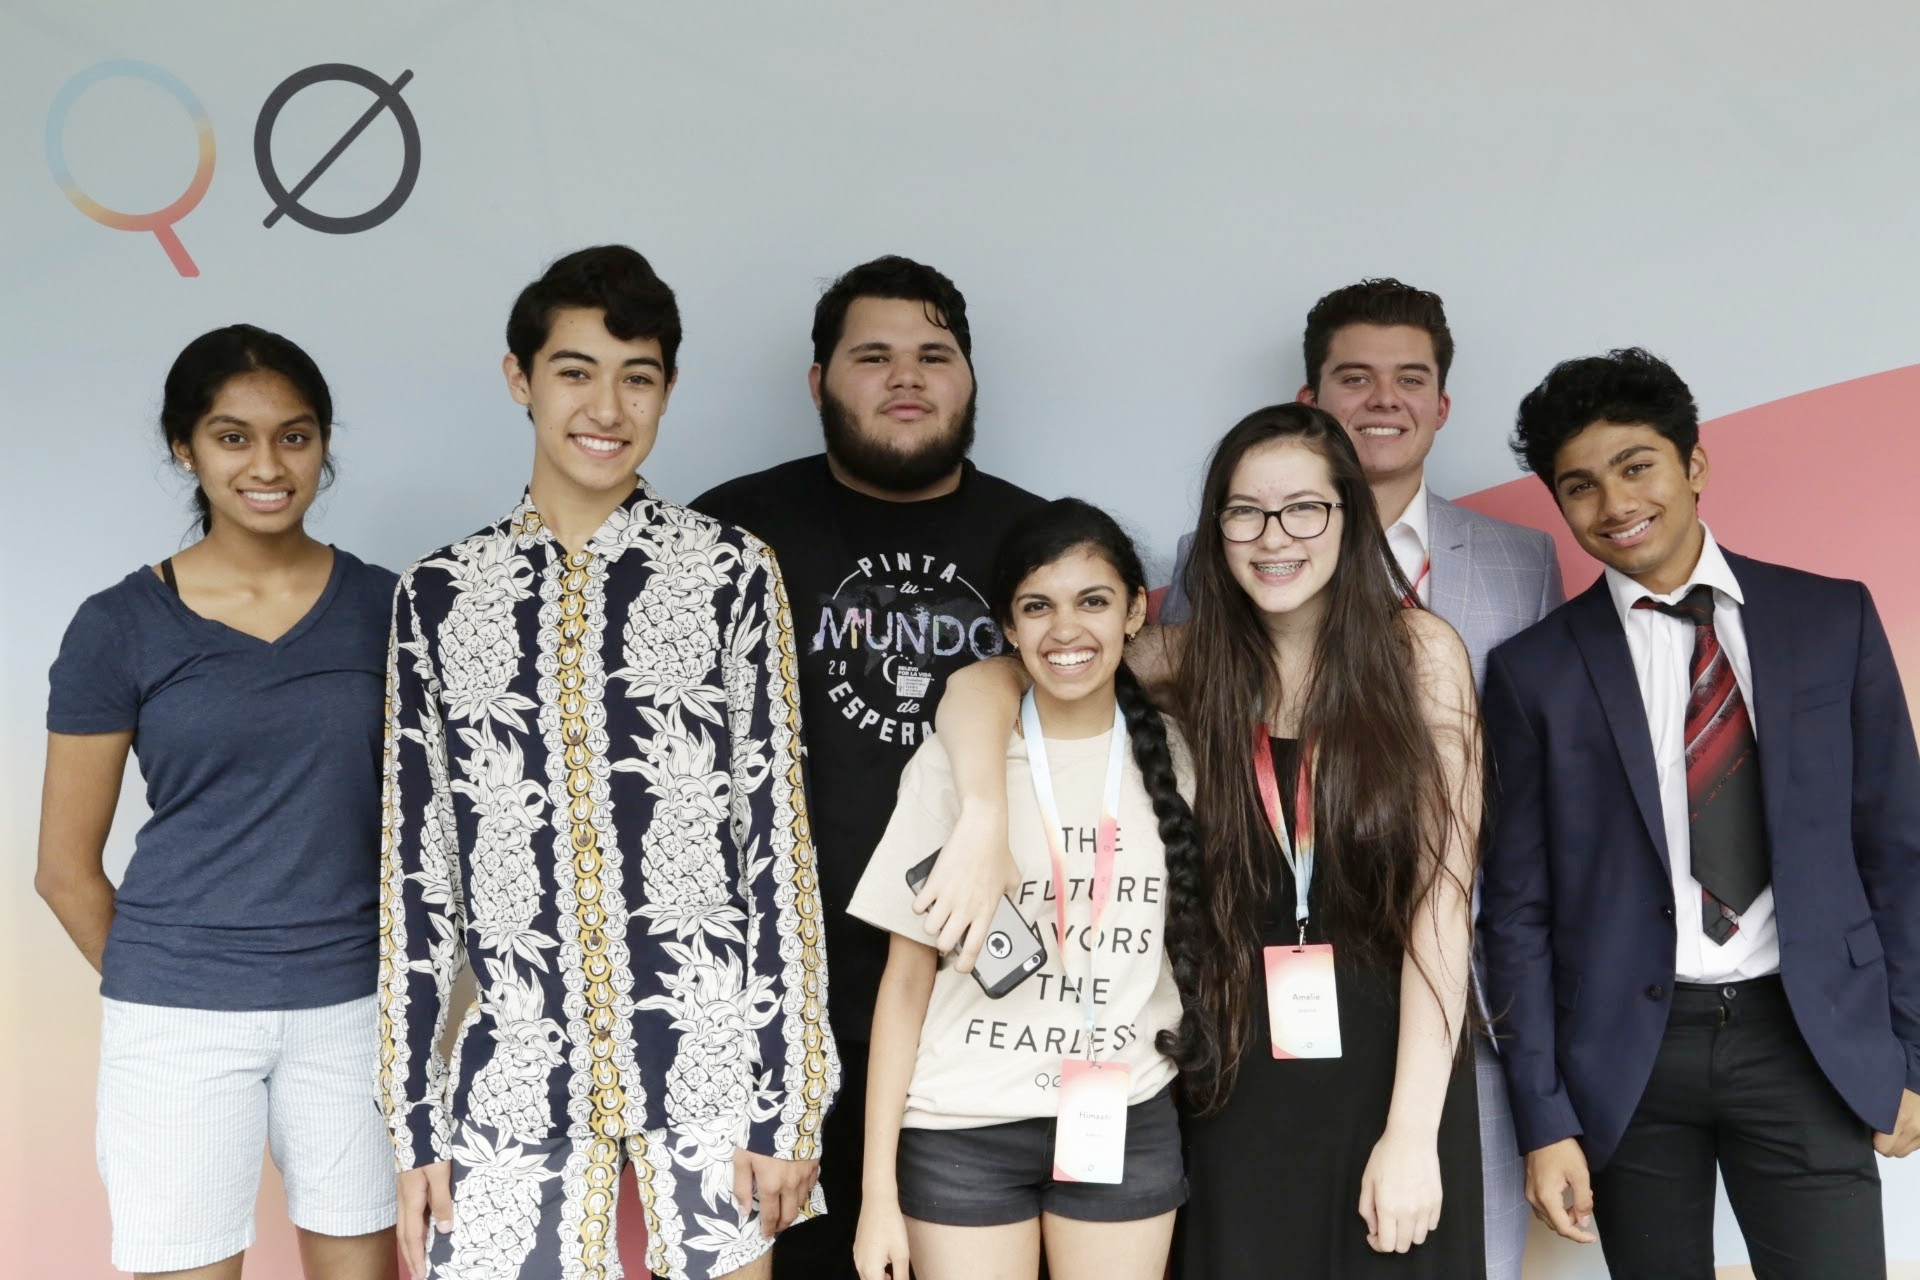 High school entrepreneurship programs